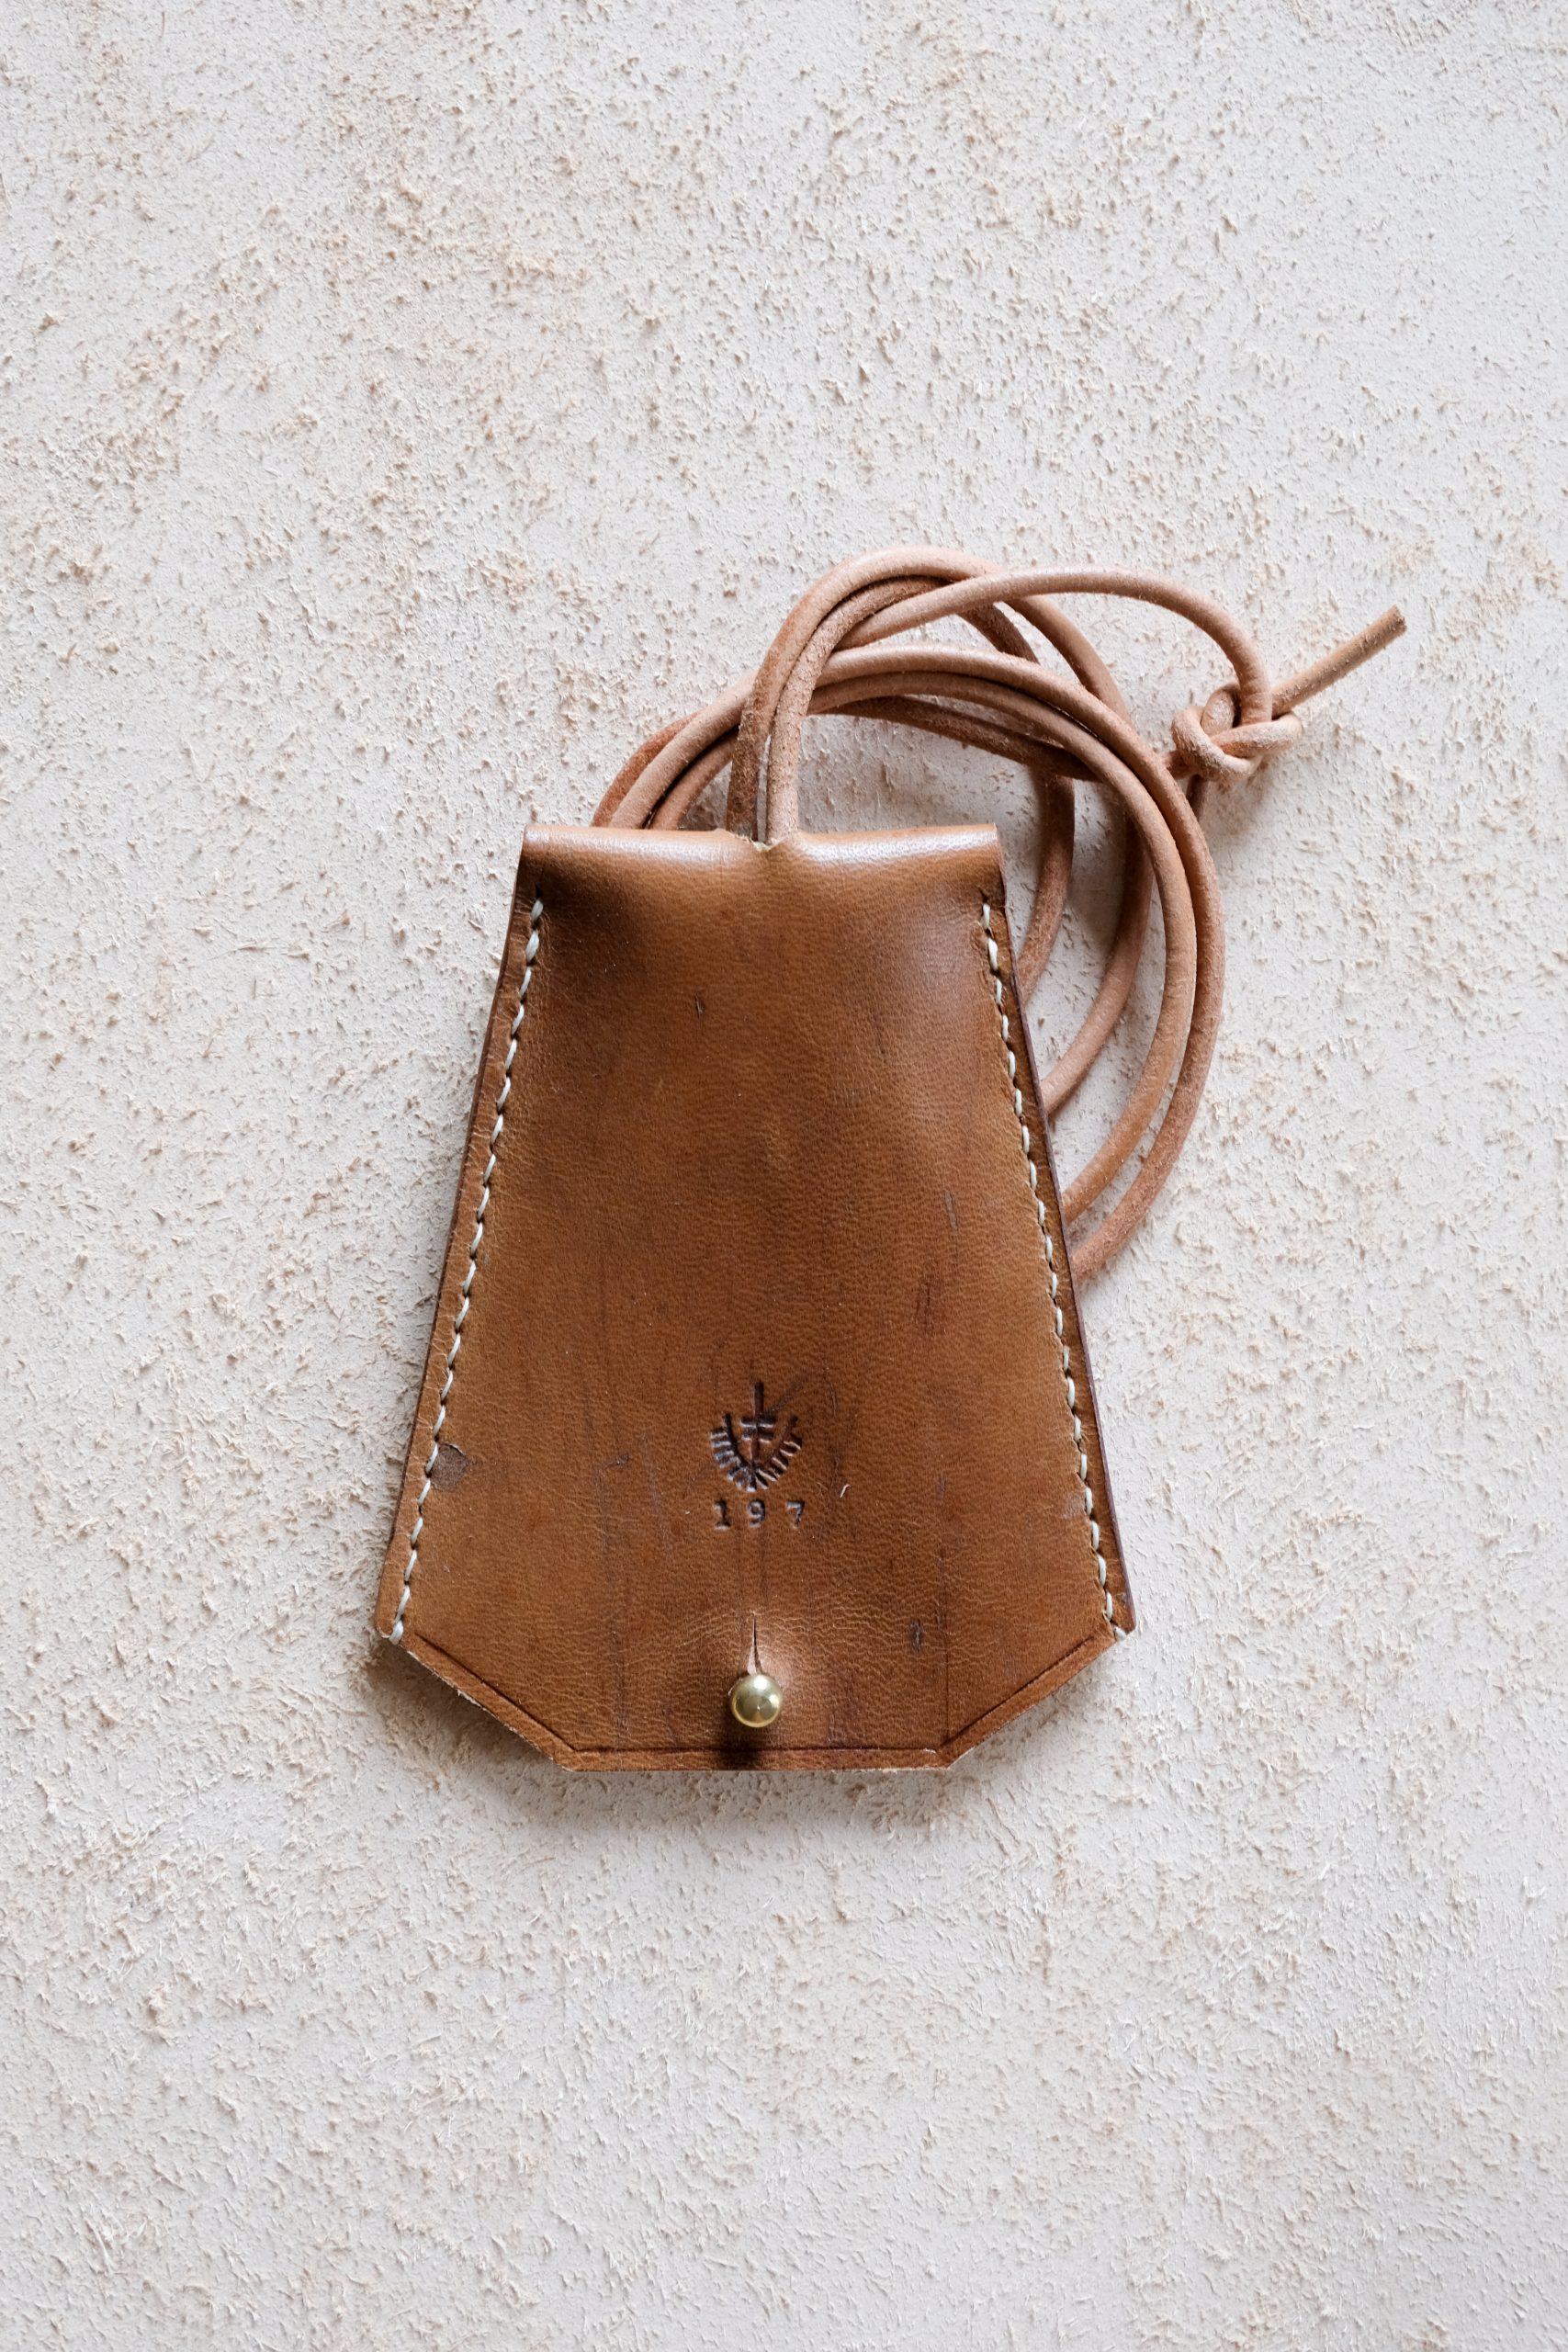 Lerif Designs leather bell key holder walnut demo on beige background